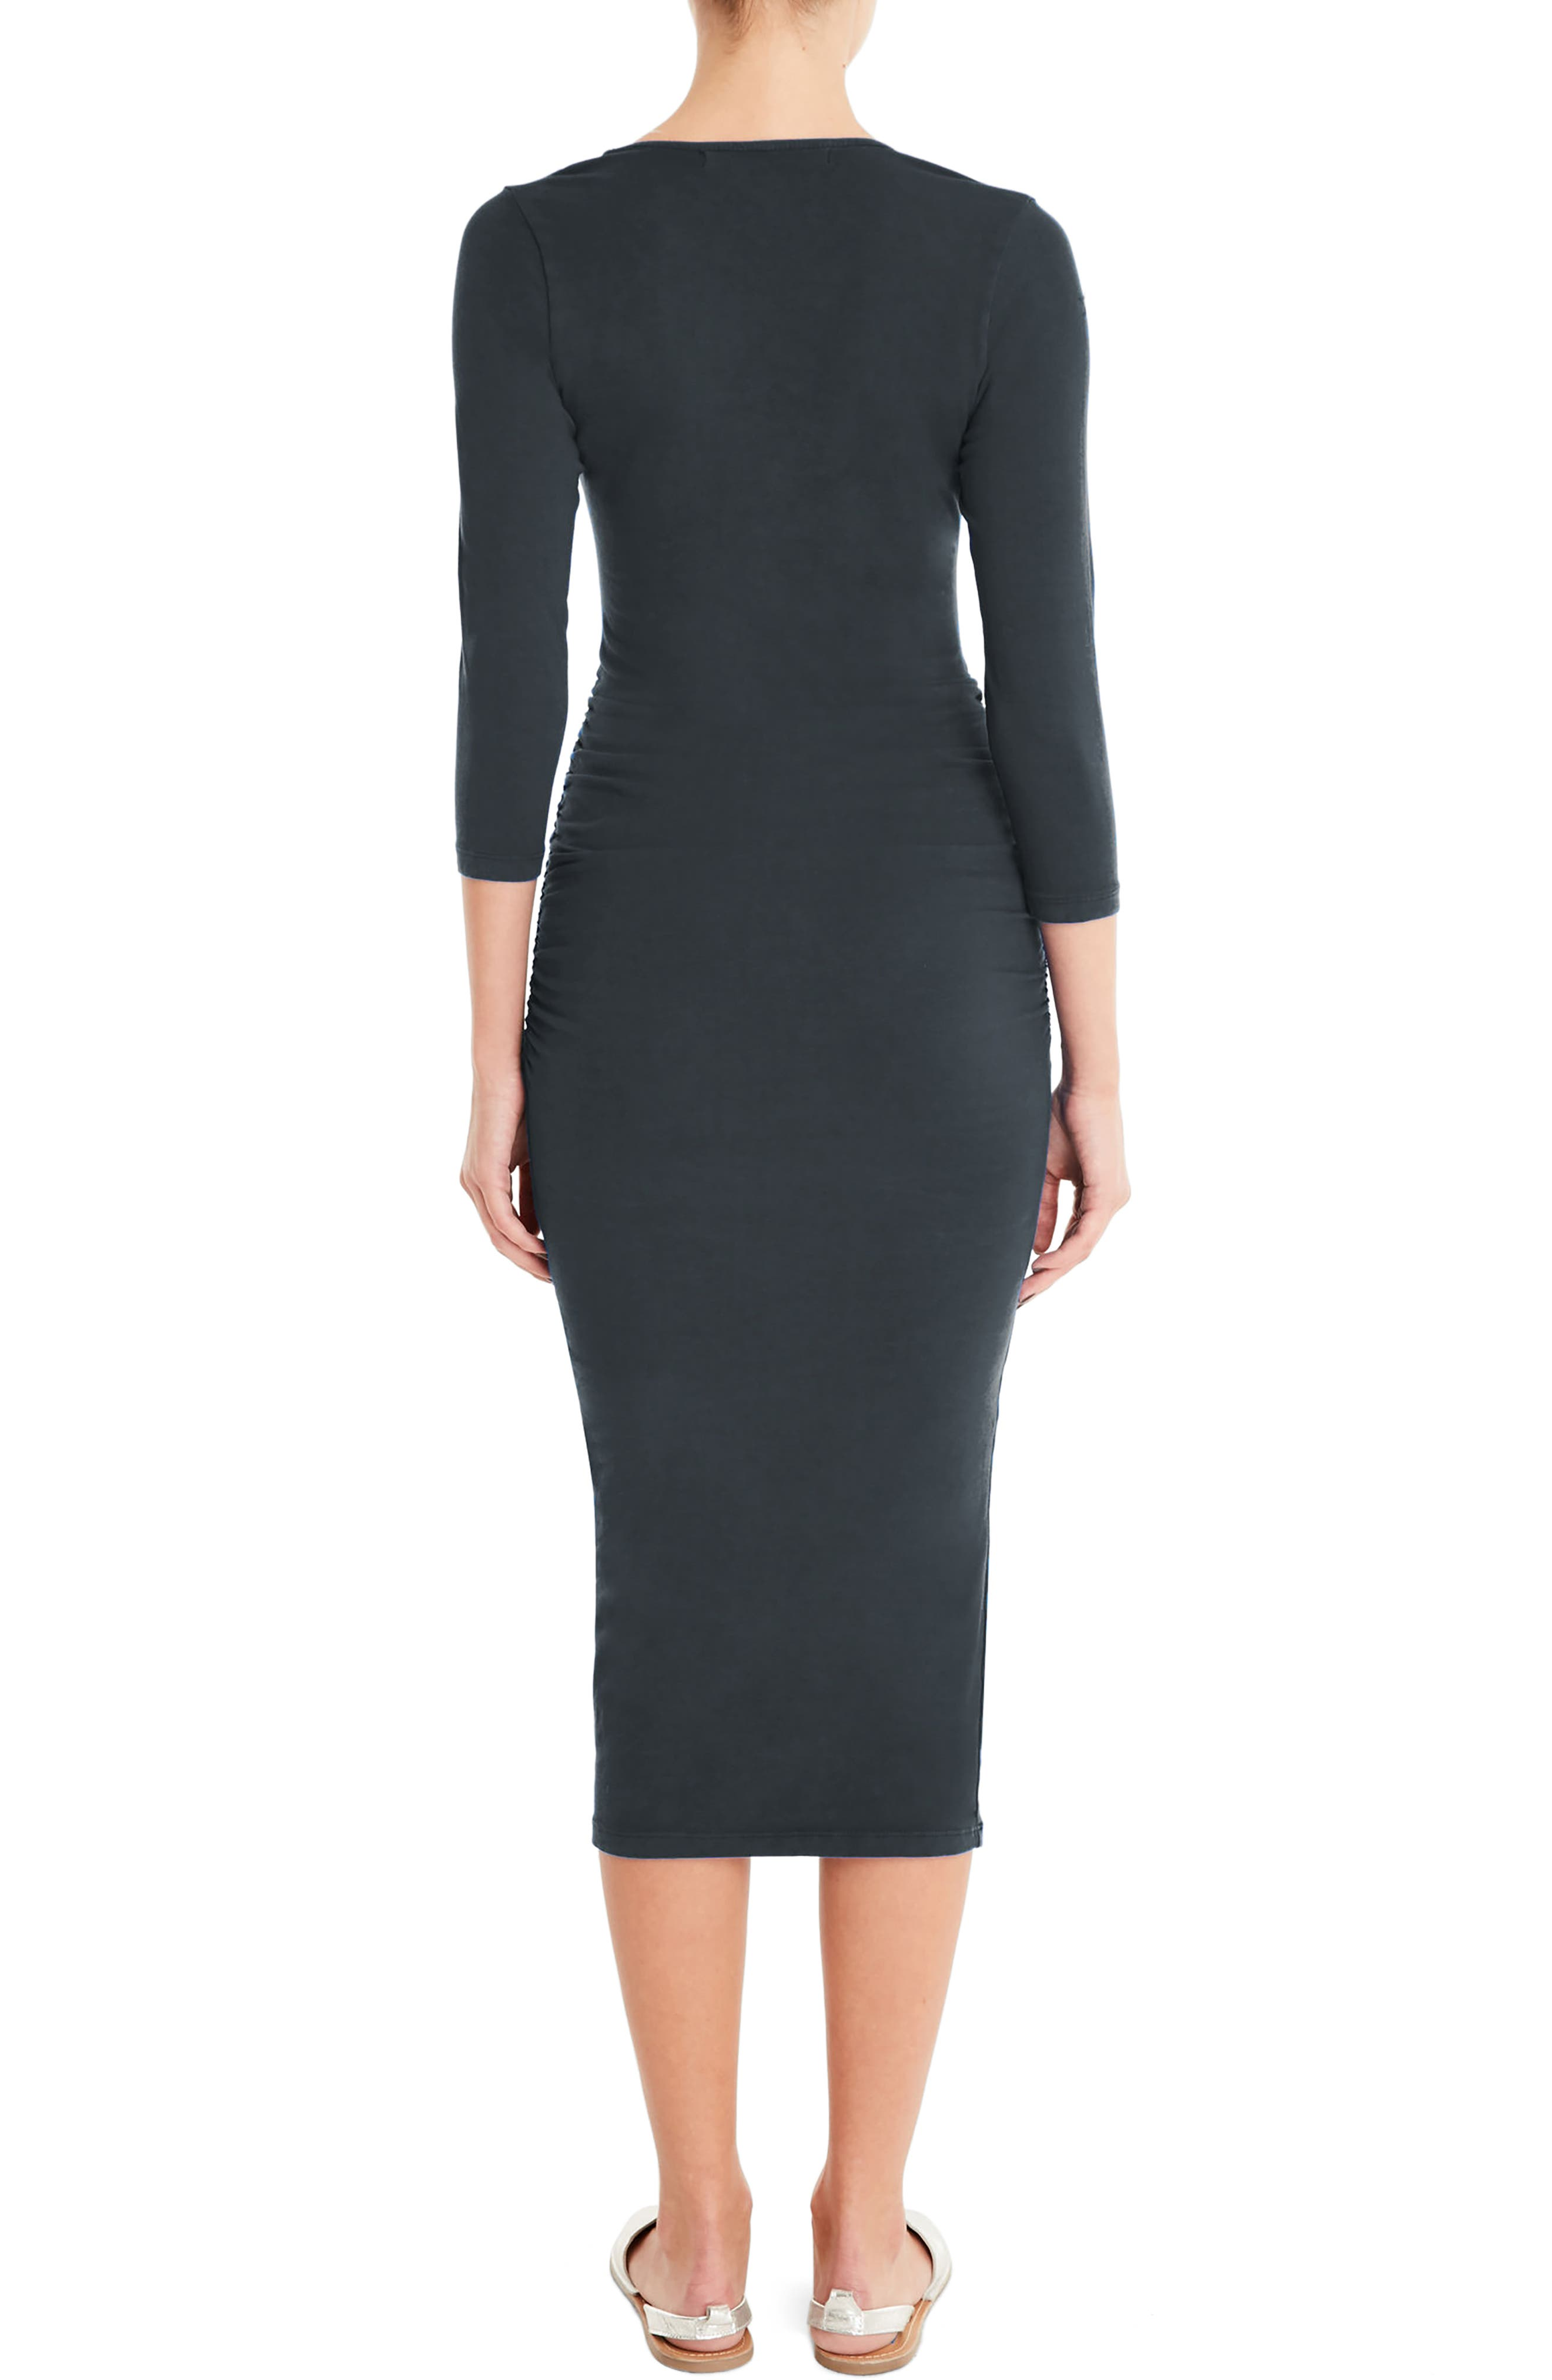 MICHAEL STARS, Ruched Midi Dress, Alternate thumbnail 2, color, OXIDE